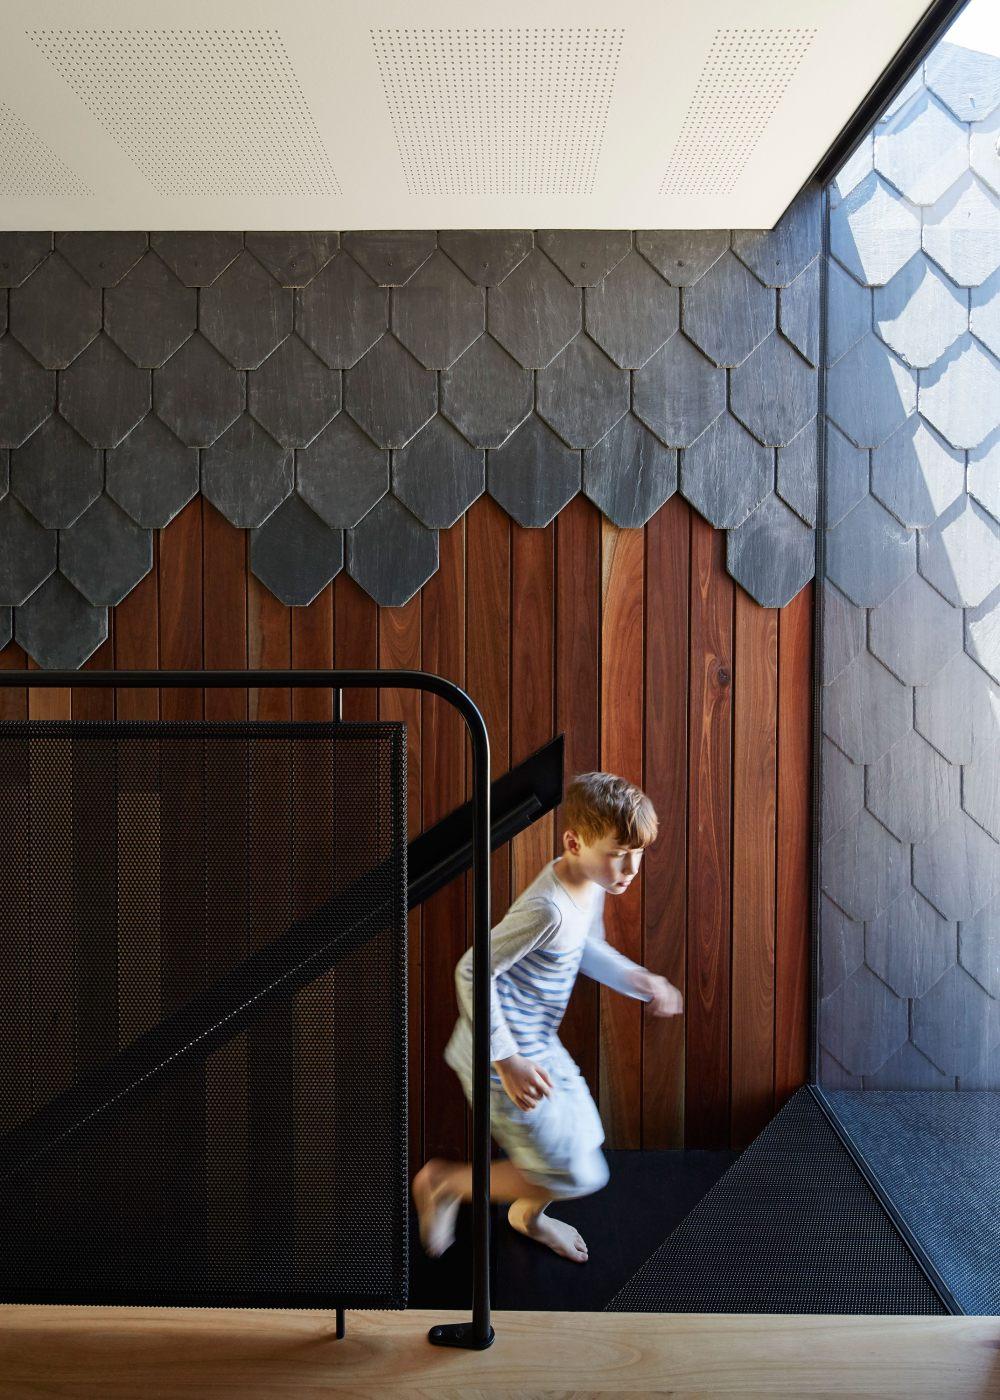 austin_maynard_architects_peter_bennetts_charles_house.jpg